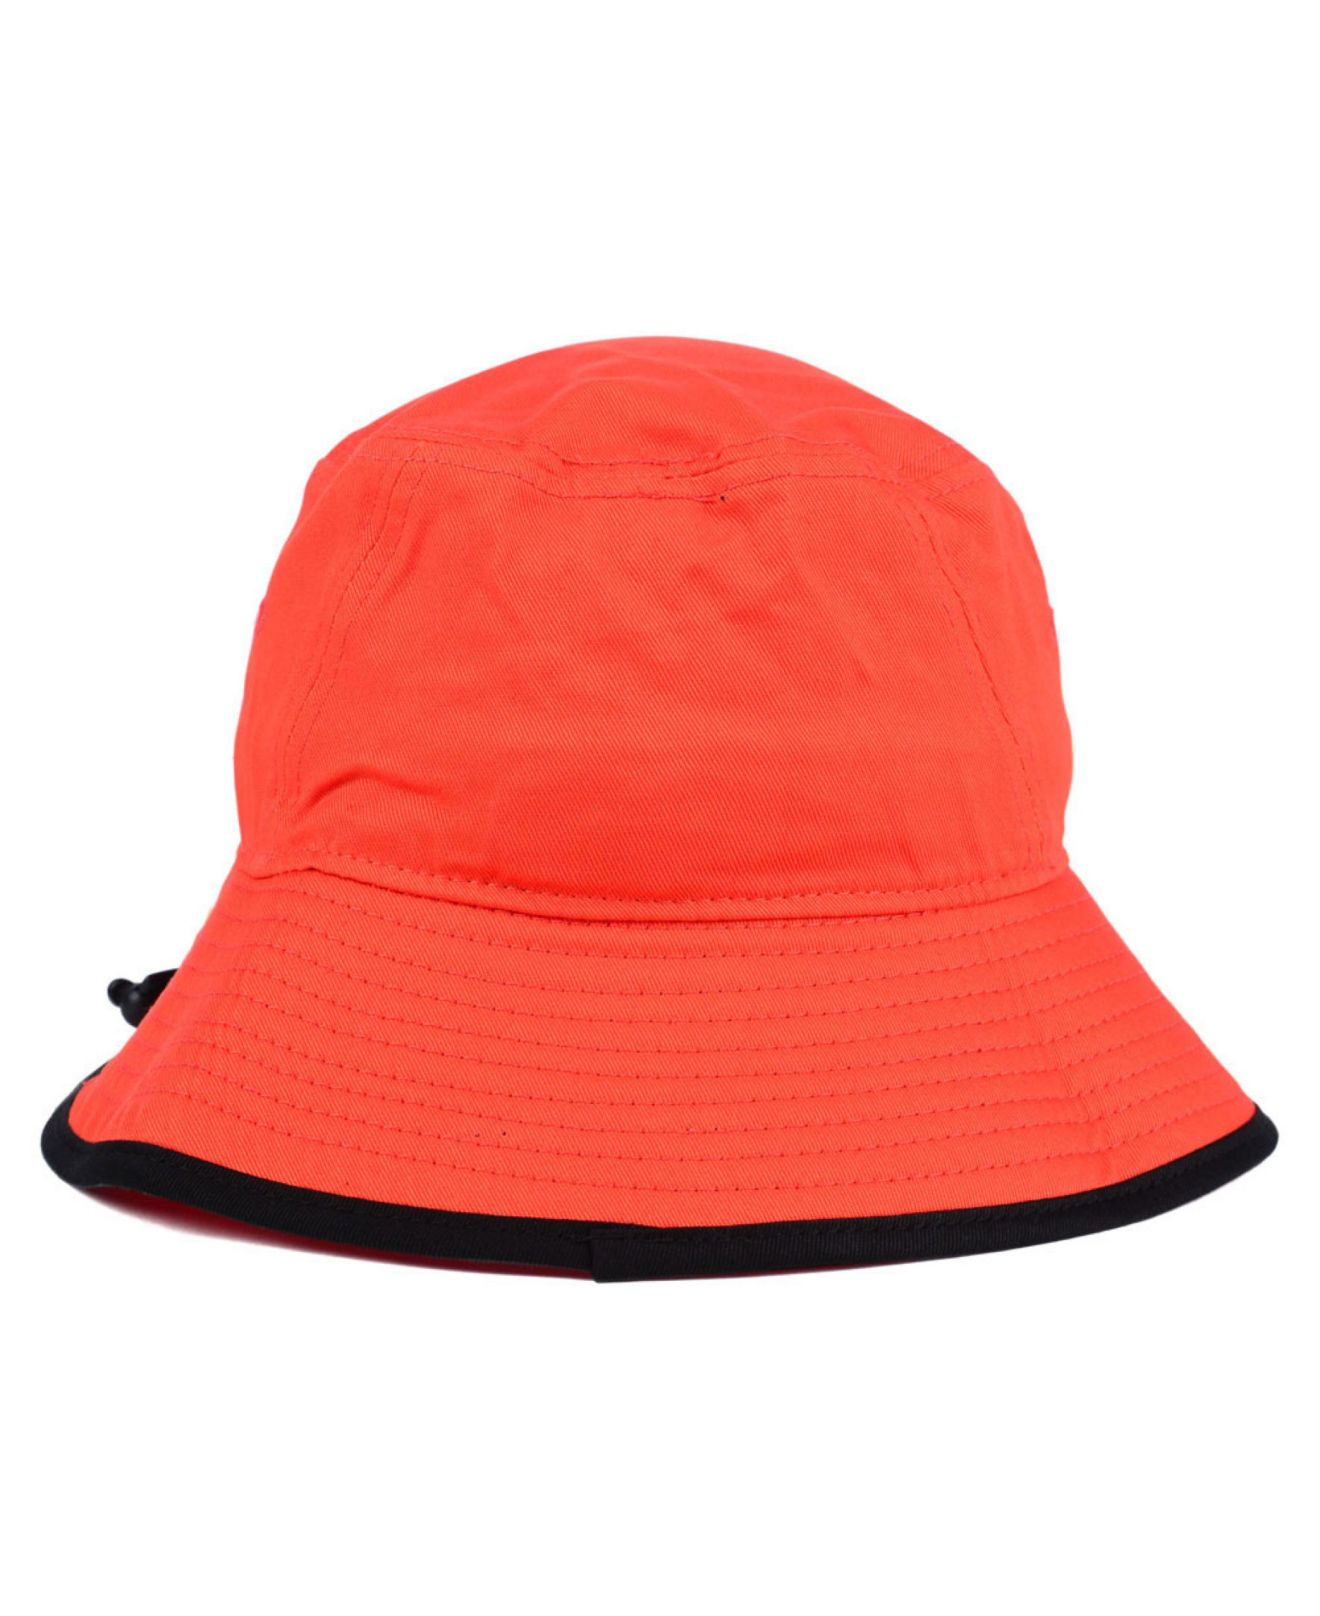 2eb2ddf9eaf new zealand the clemson tigers safari hat 2d8e0 00739  cheap lyst ktz  oregon state beavers tip bucket hat in orange for men c9b88 6c4fc